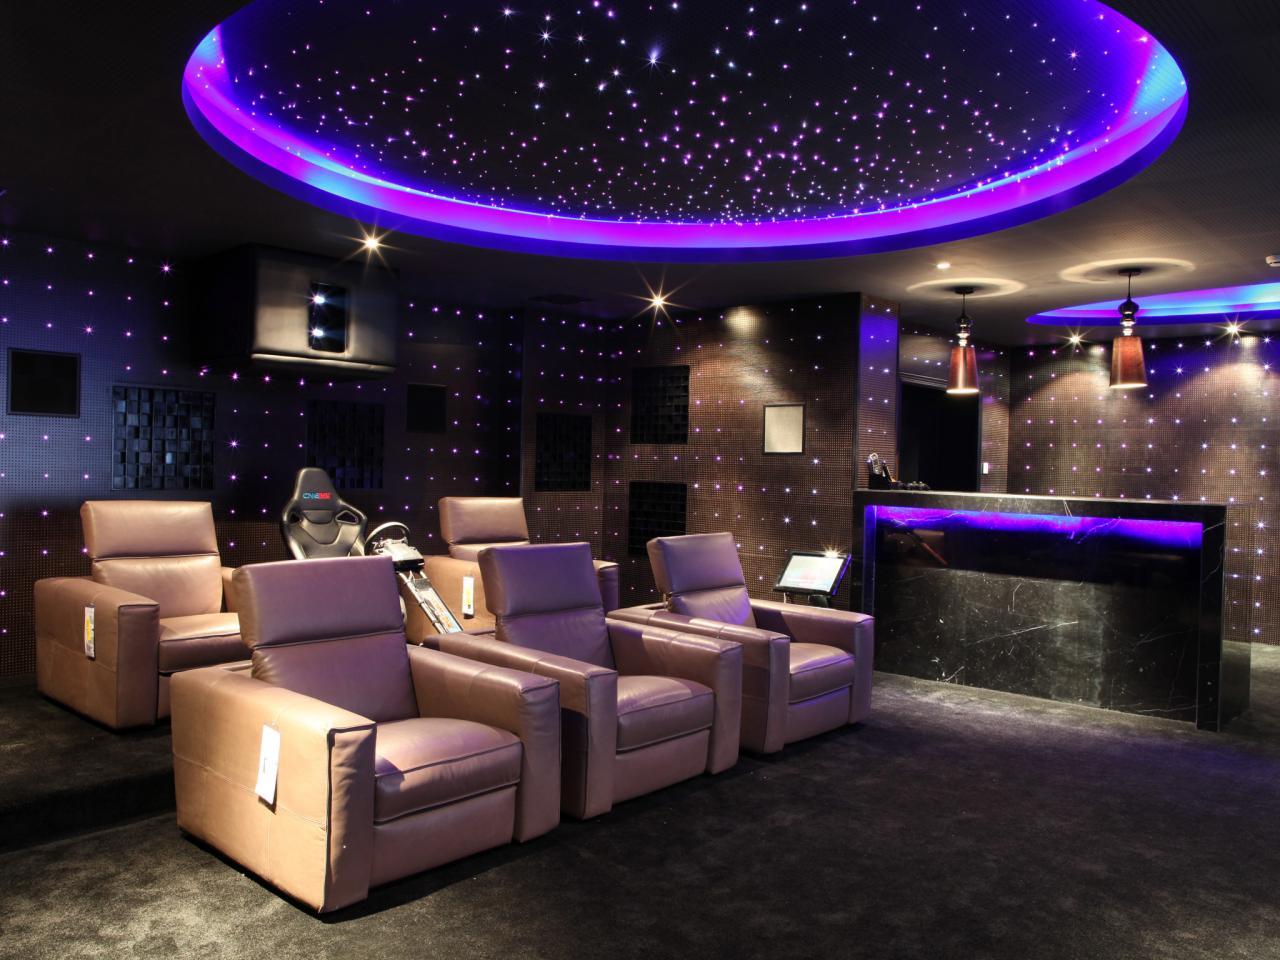 Salle de cinéma maison de style futuriste avec plafond étoilé